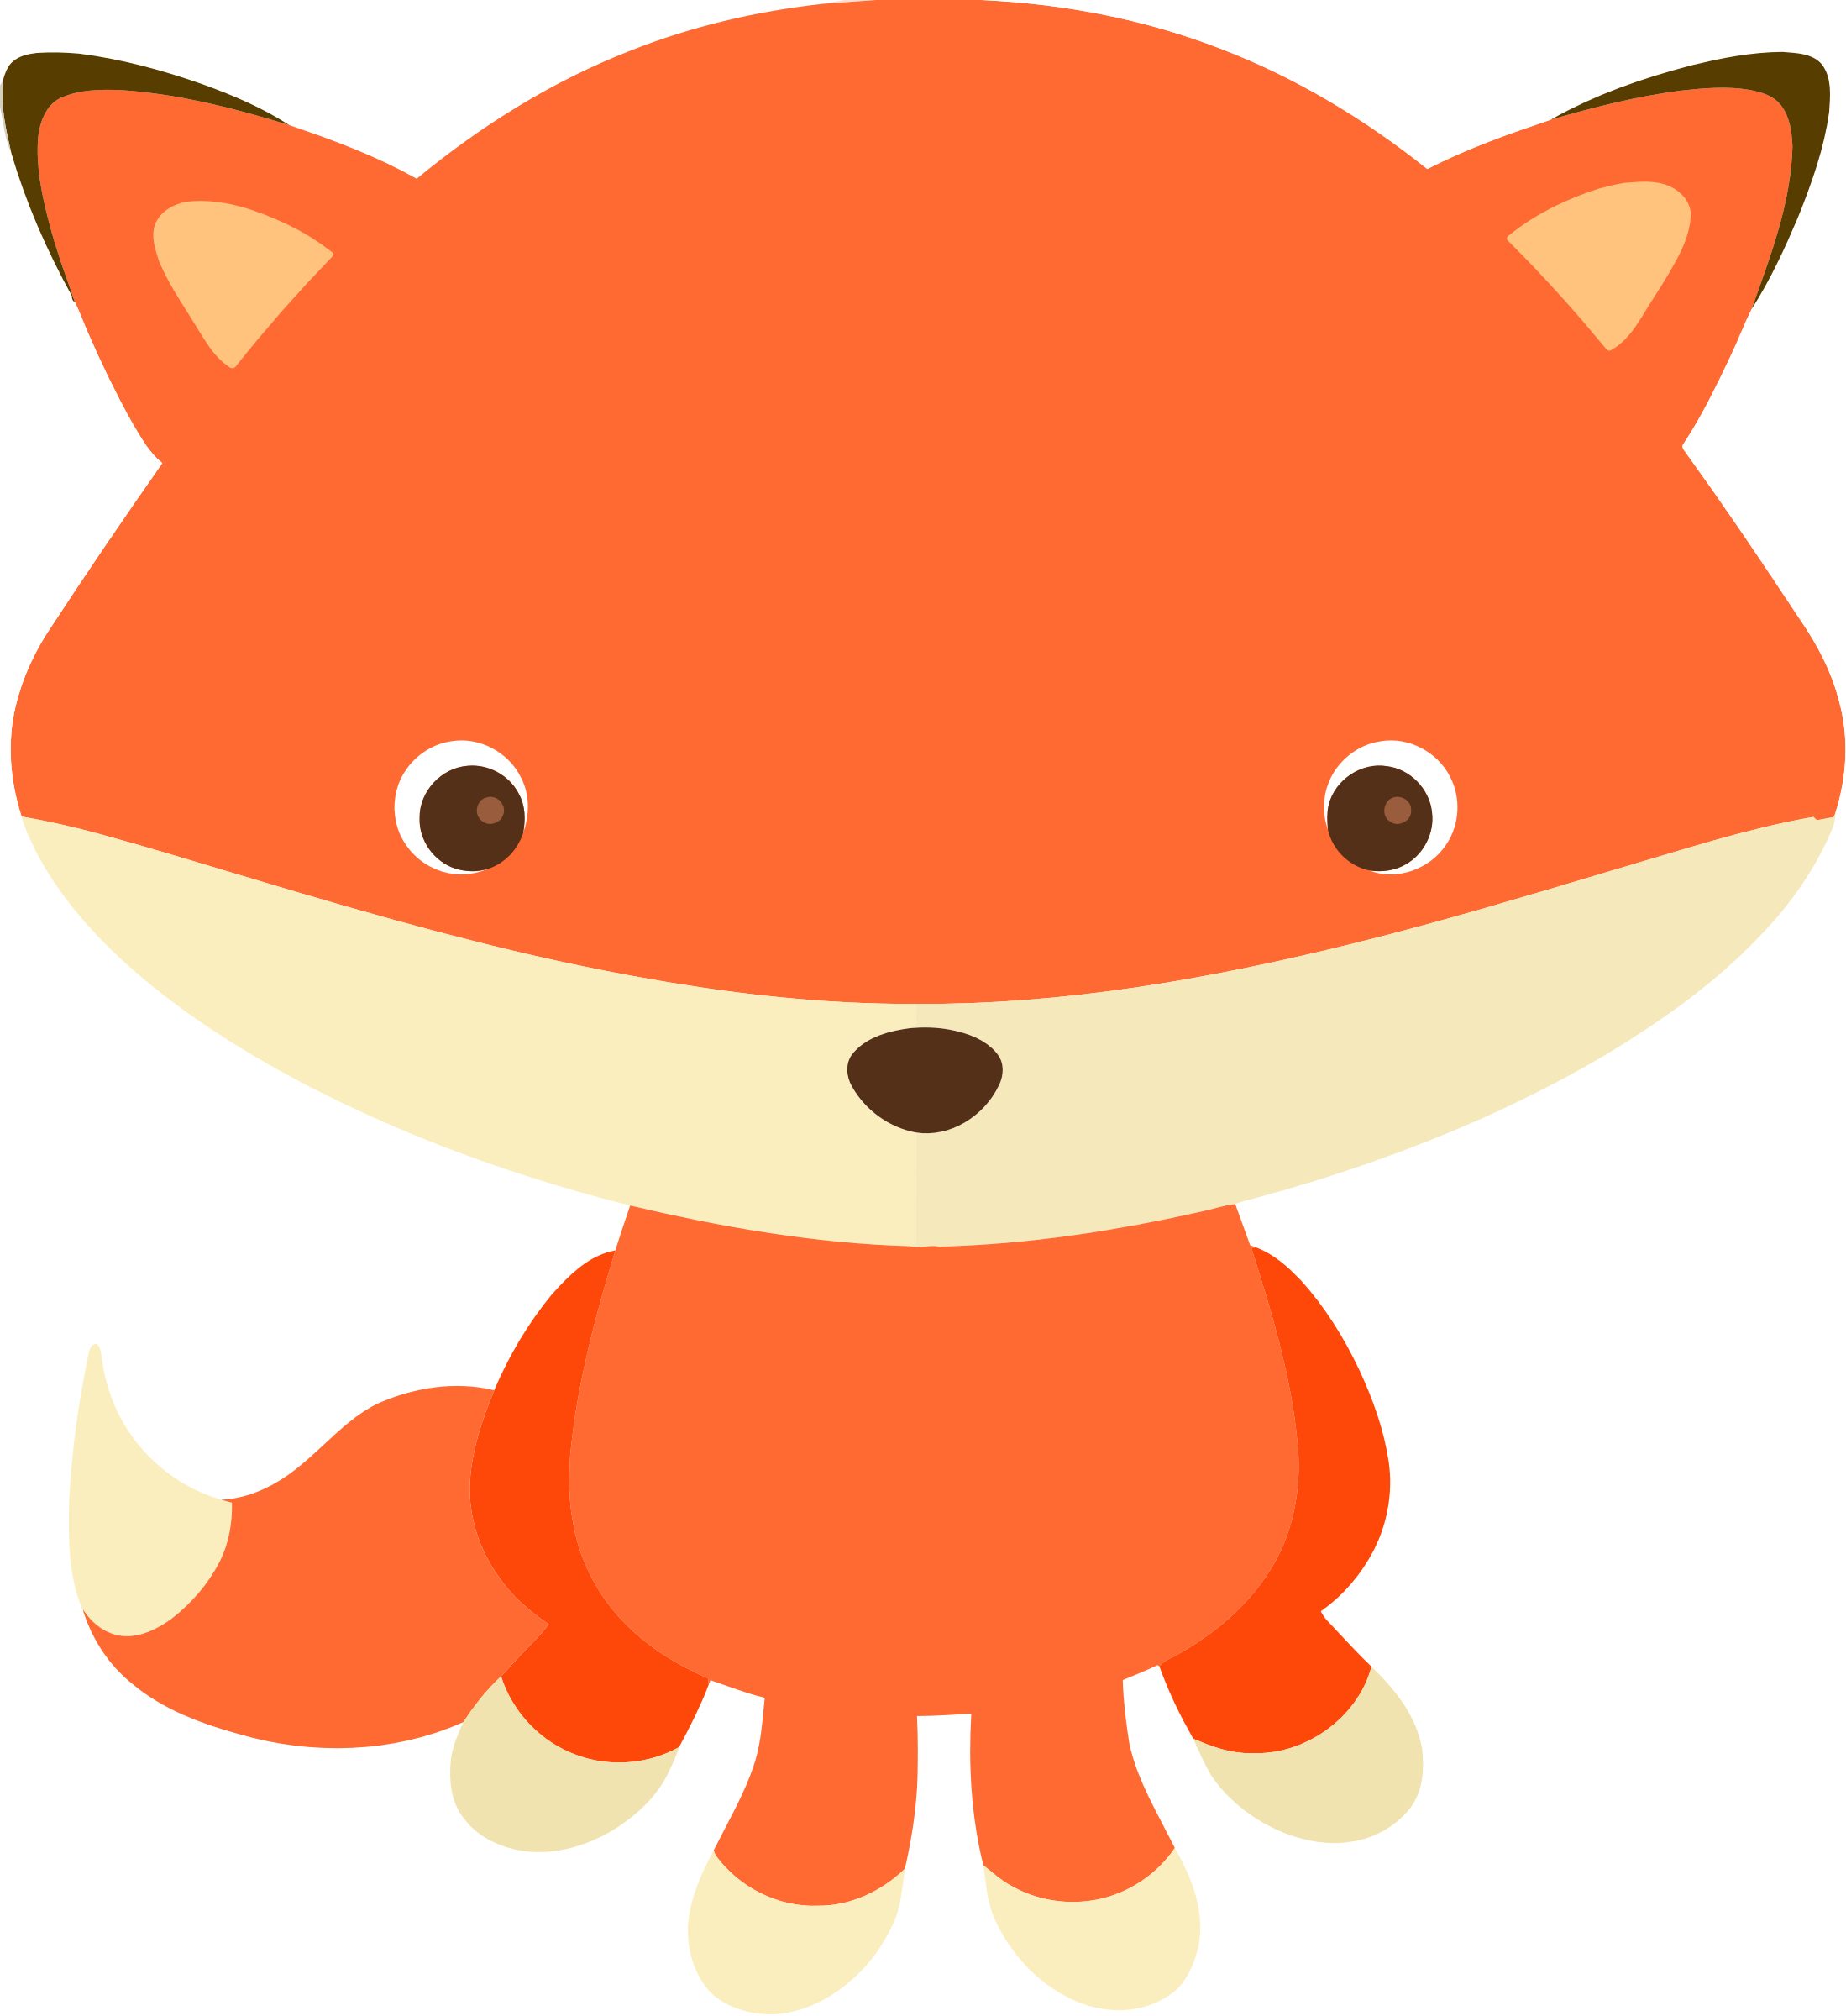 Fox cute. Orange vector clipart image